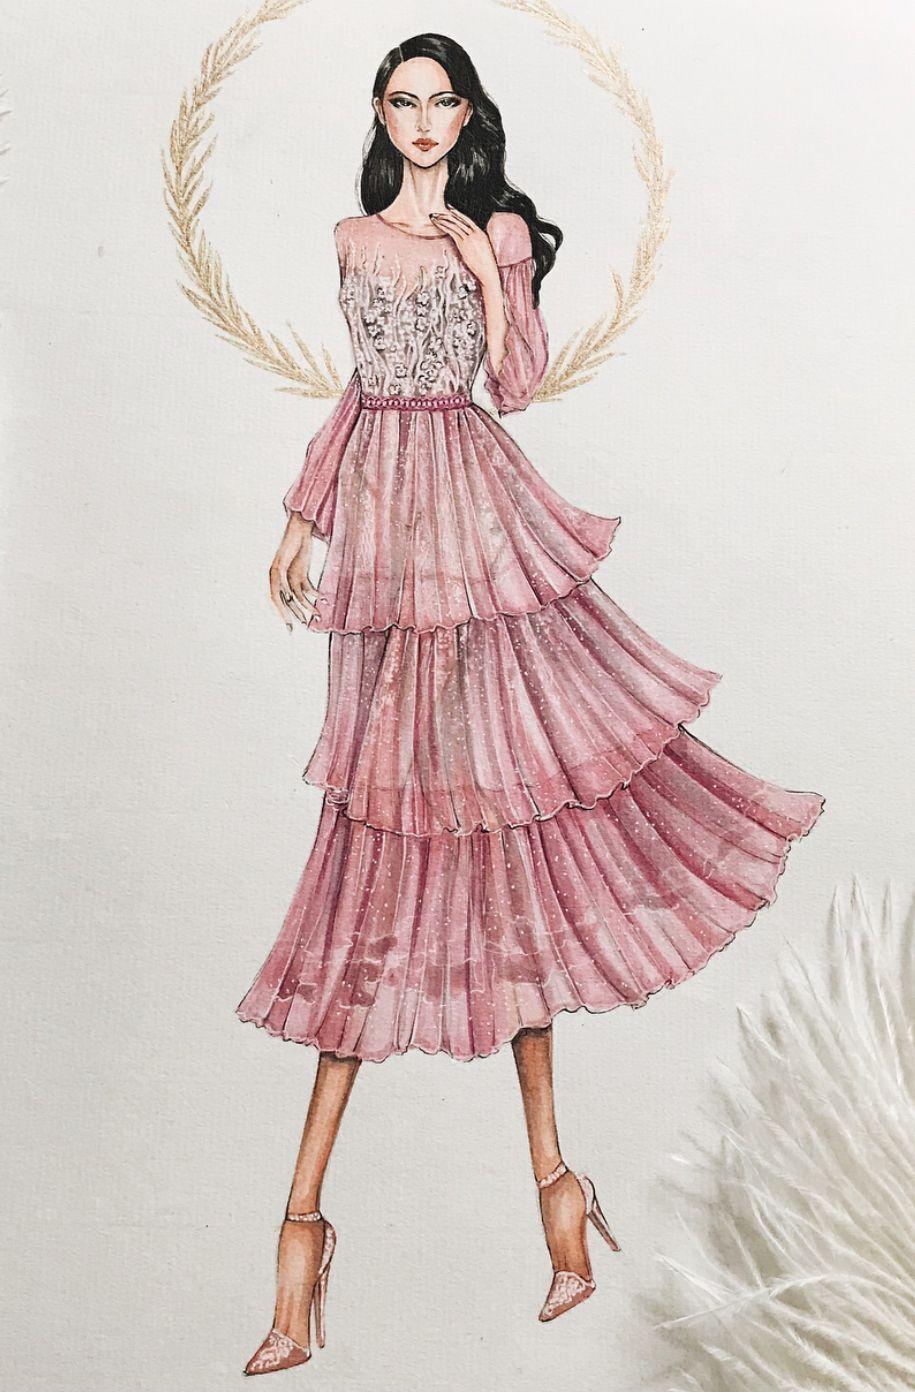 Pin de Shehrizad Style en dress sketches   Pinterest   Ilustraciones ...